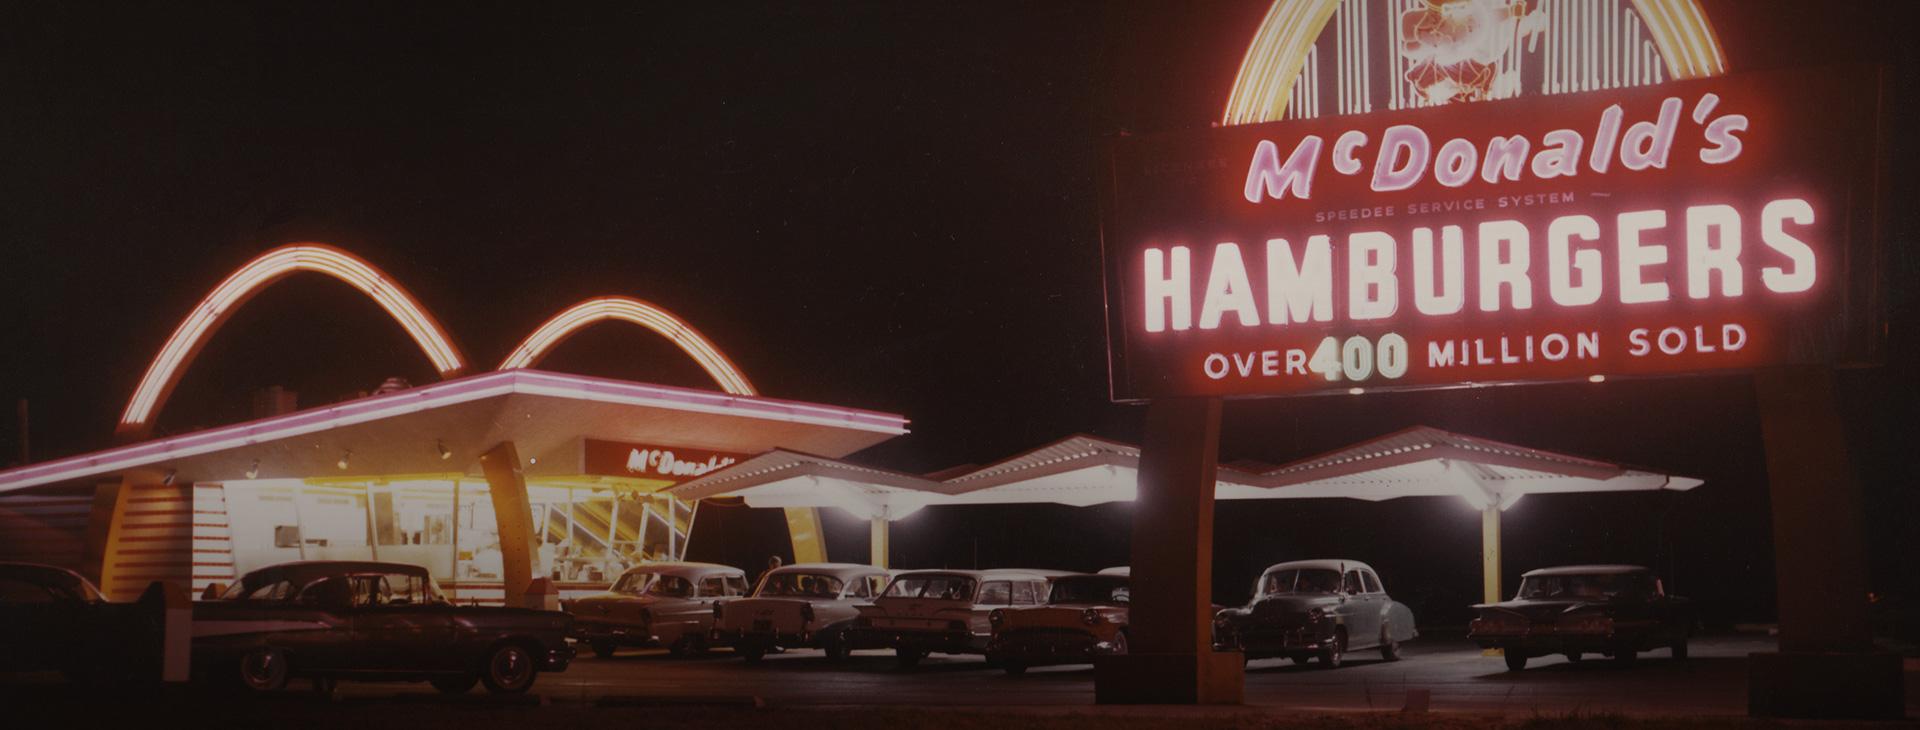 "Old-school McDonald's restaurant, bragging on ""Over 400 million"" burgers sold."